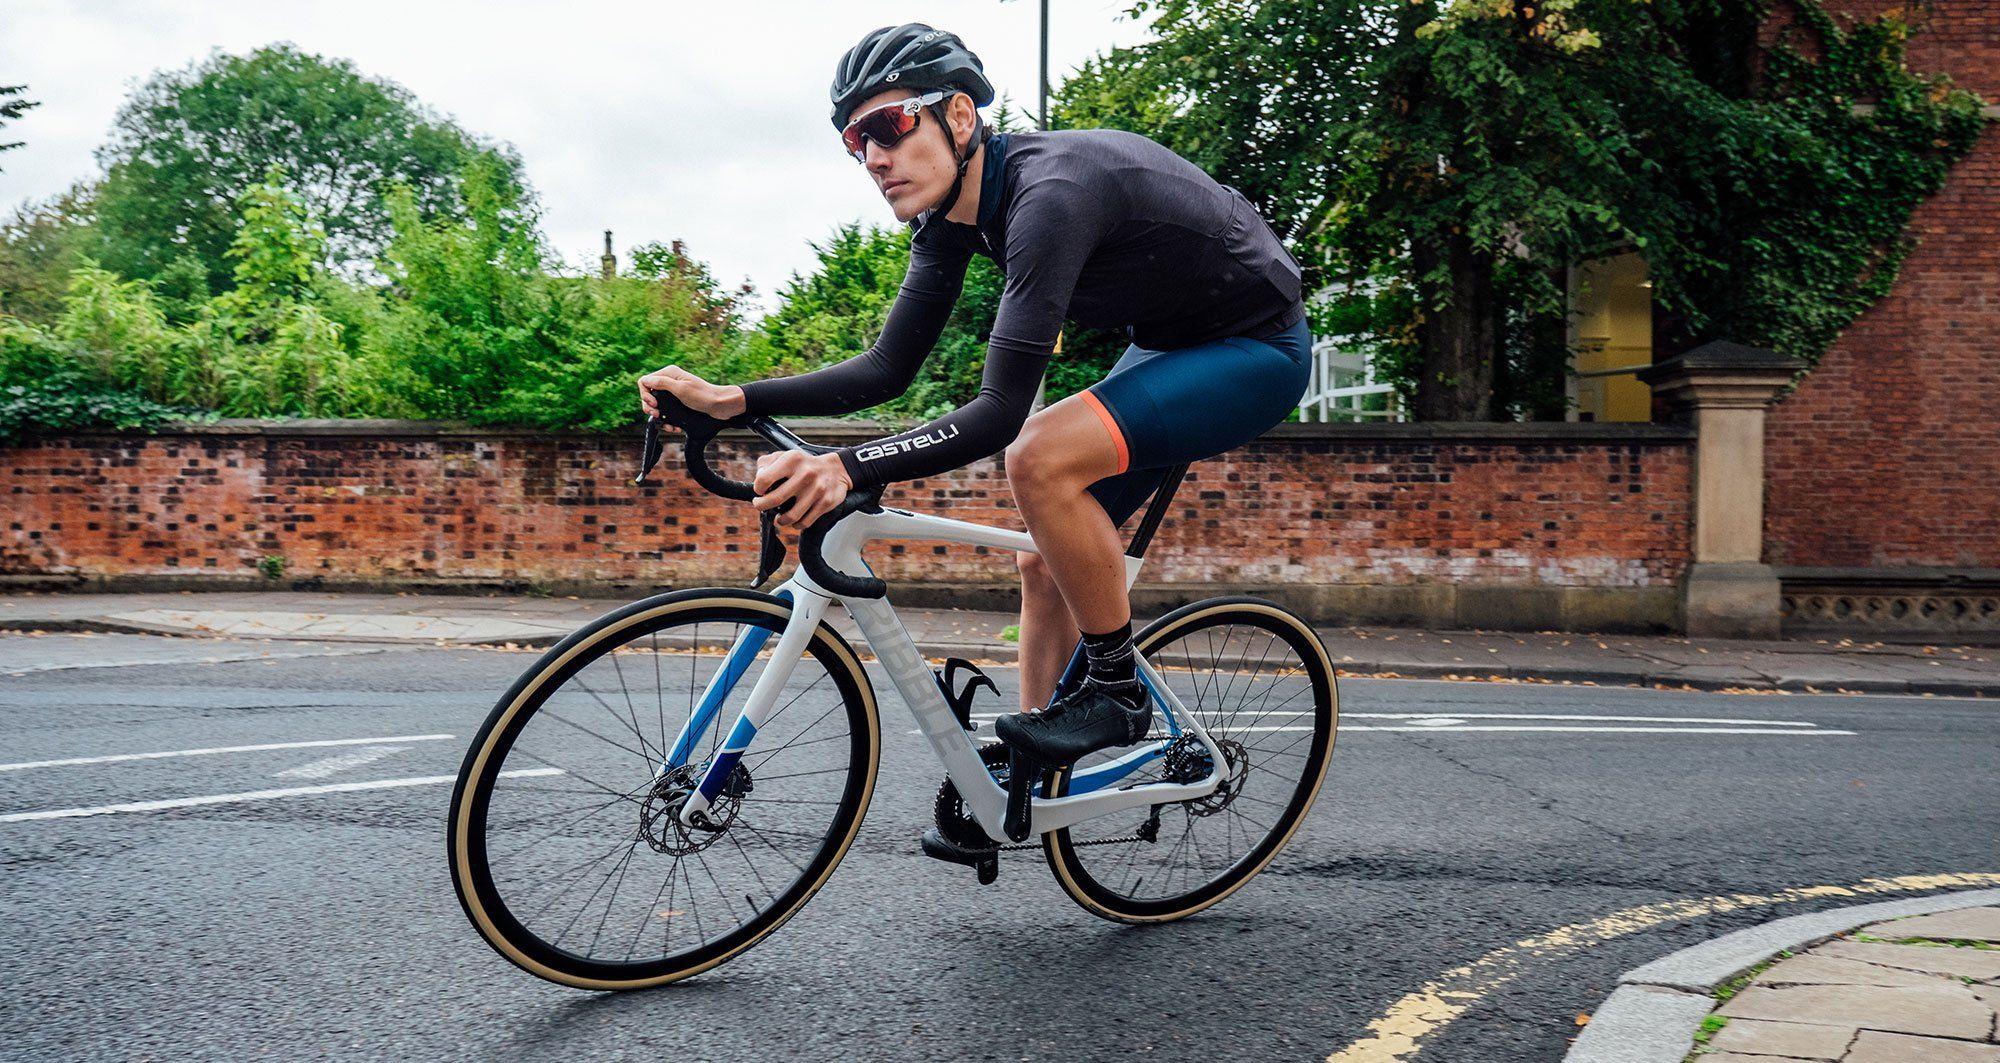 Ribble Endurance Sle Electric Road Bike Ribble Cycles